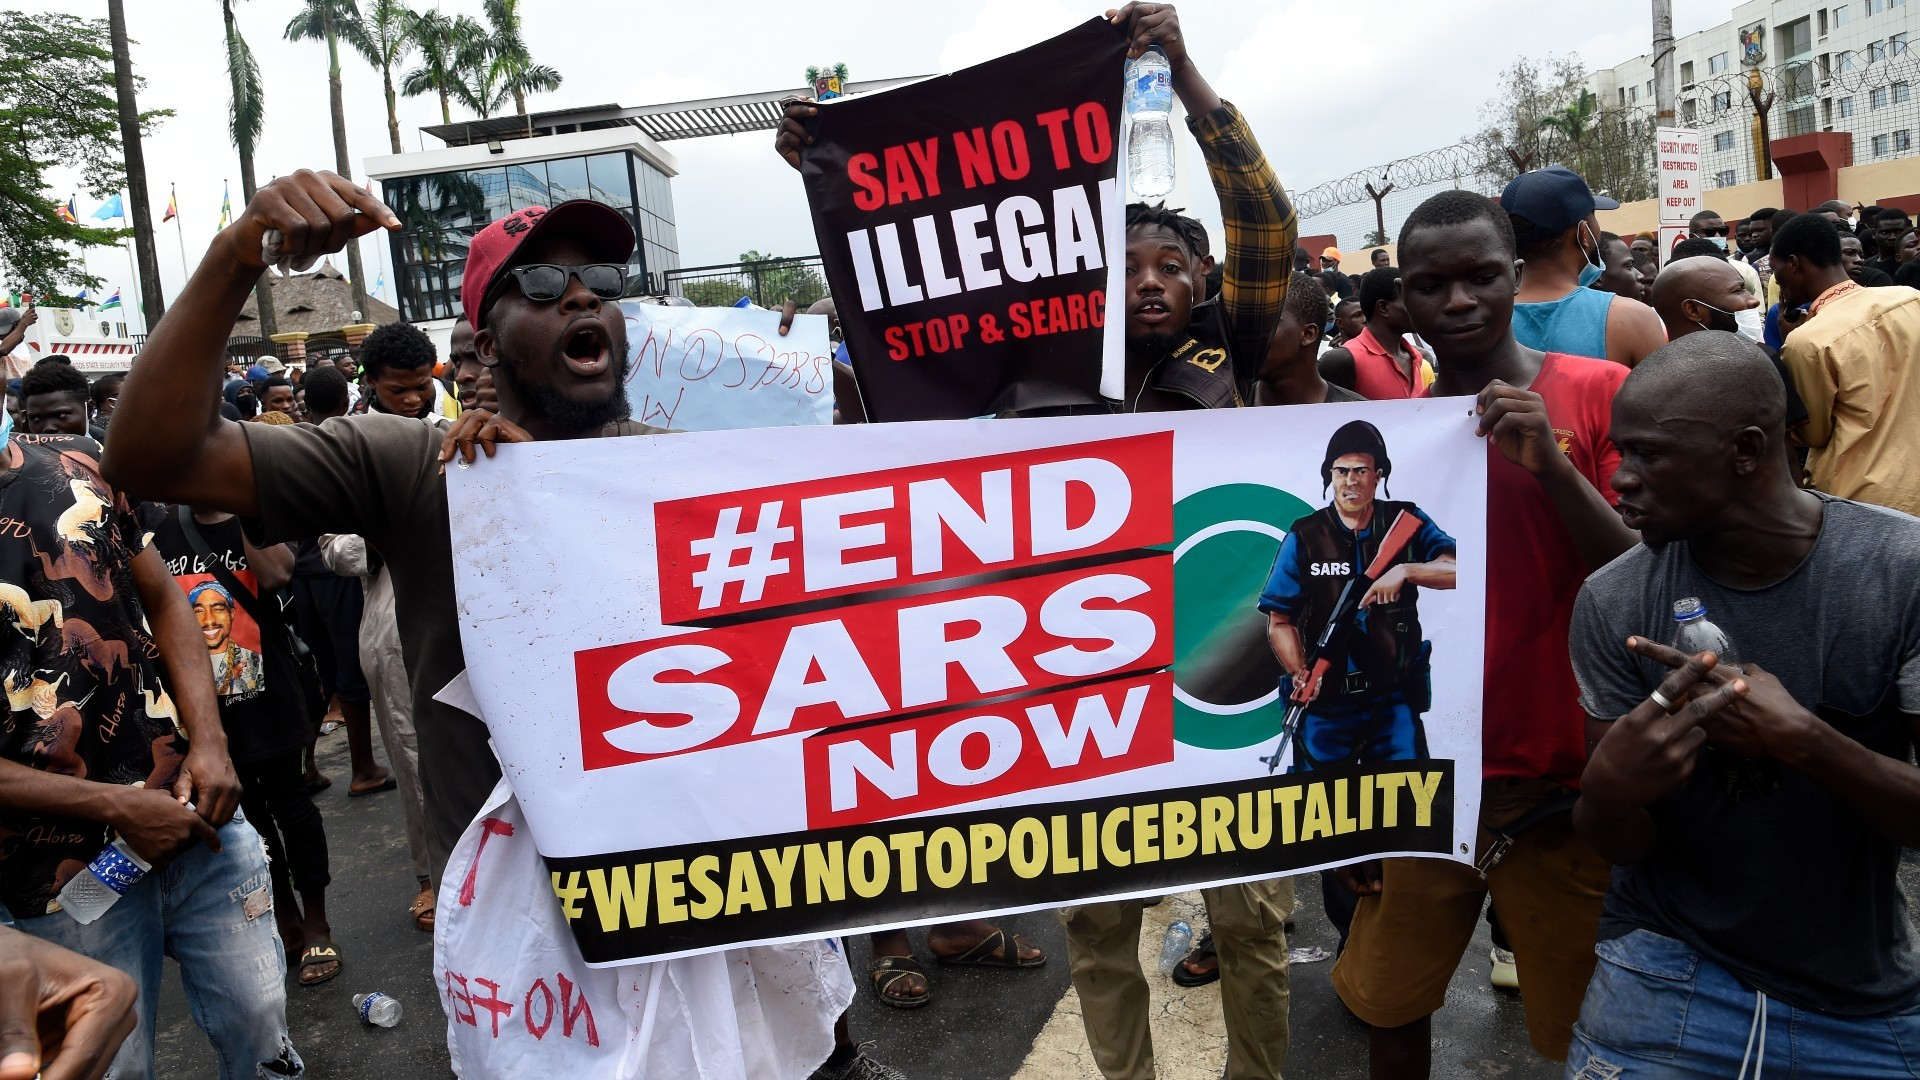 'Enough is enough': Nigerians demand SARS police unit scrapped